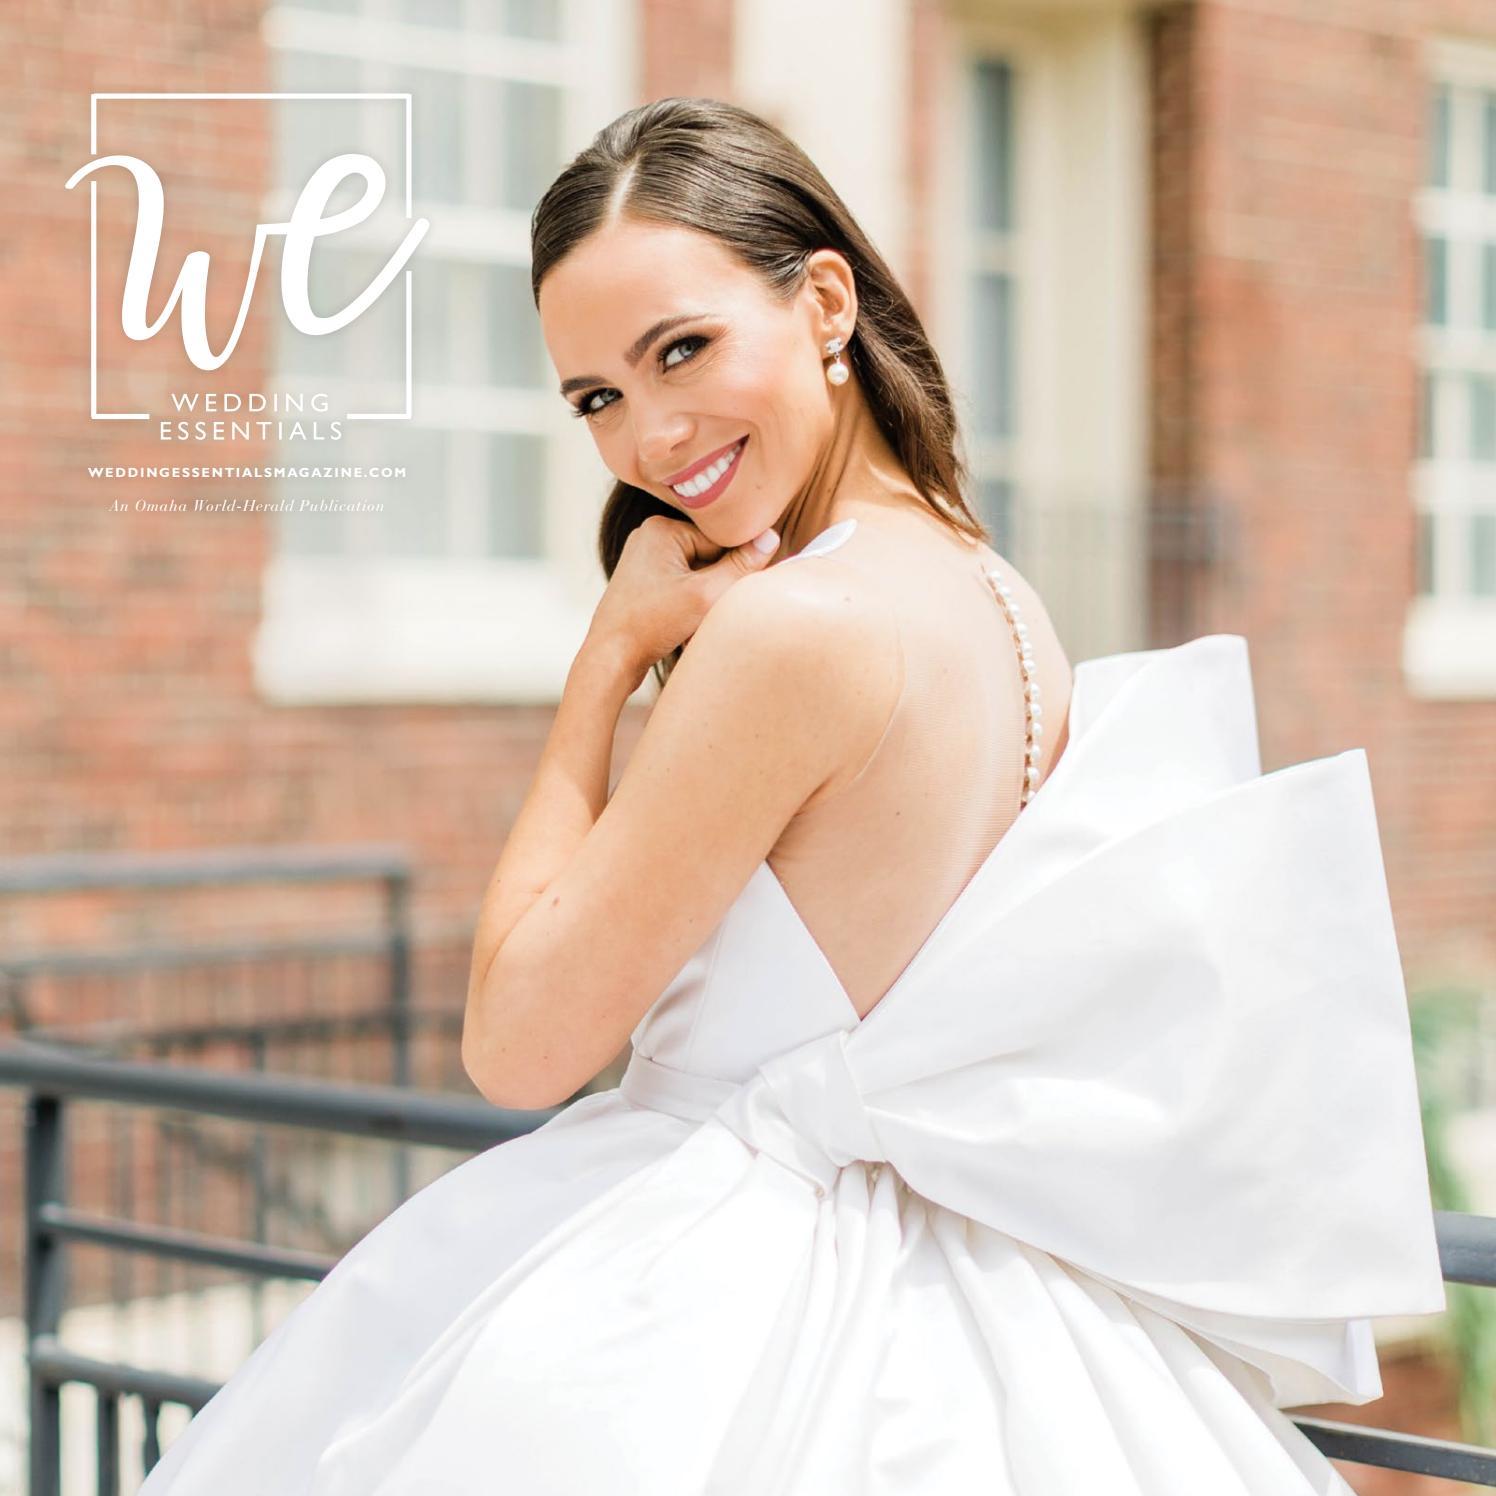 Wedding Essentials Winter 2020 By Omaha World Herald Issuu,Homecoming Wedding Dresses In Sri Lanka